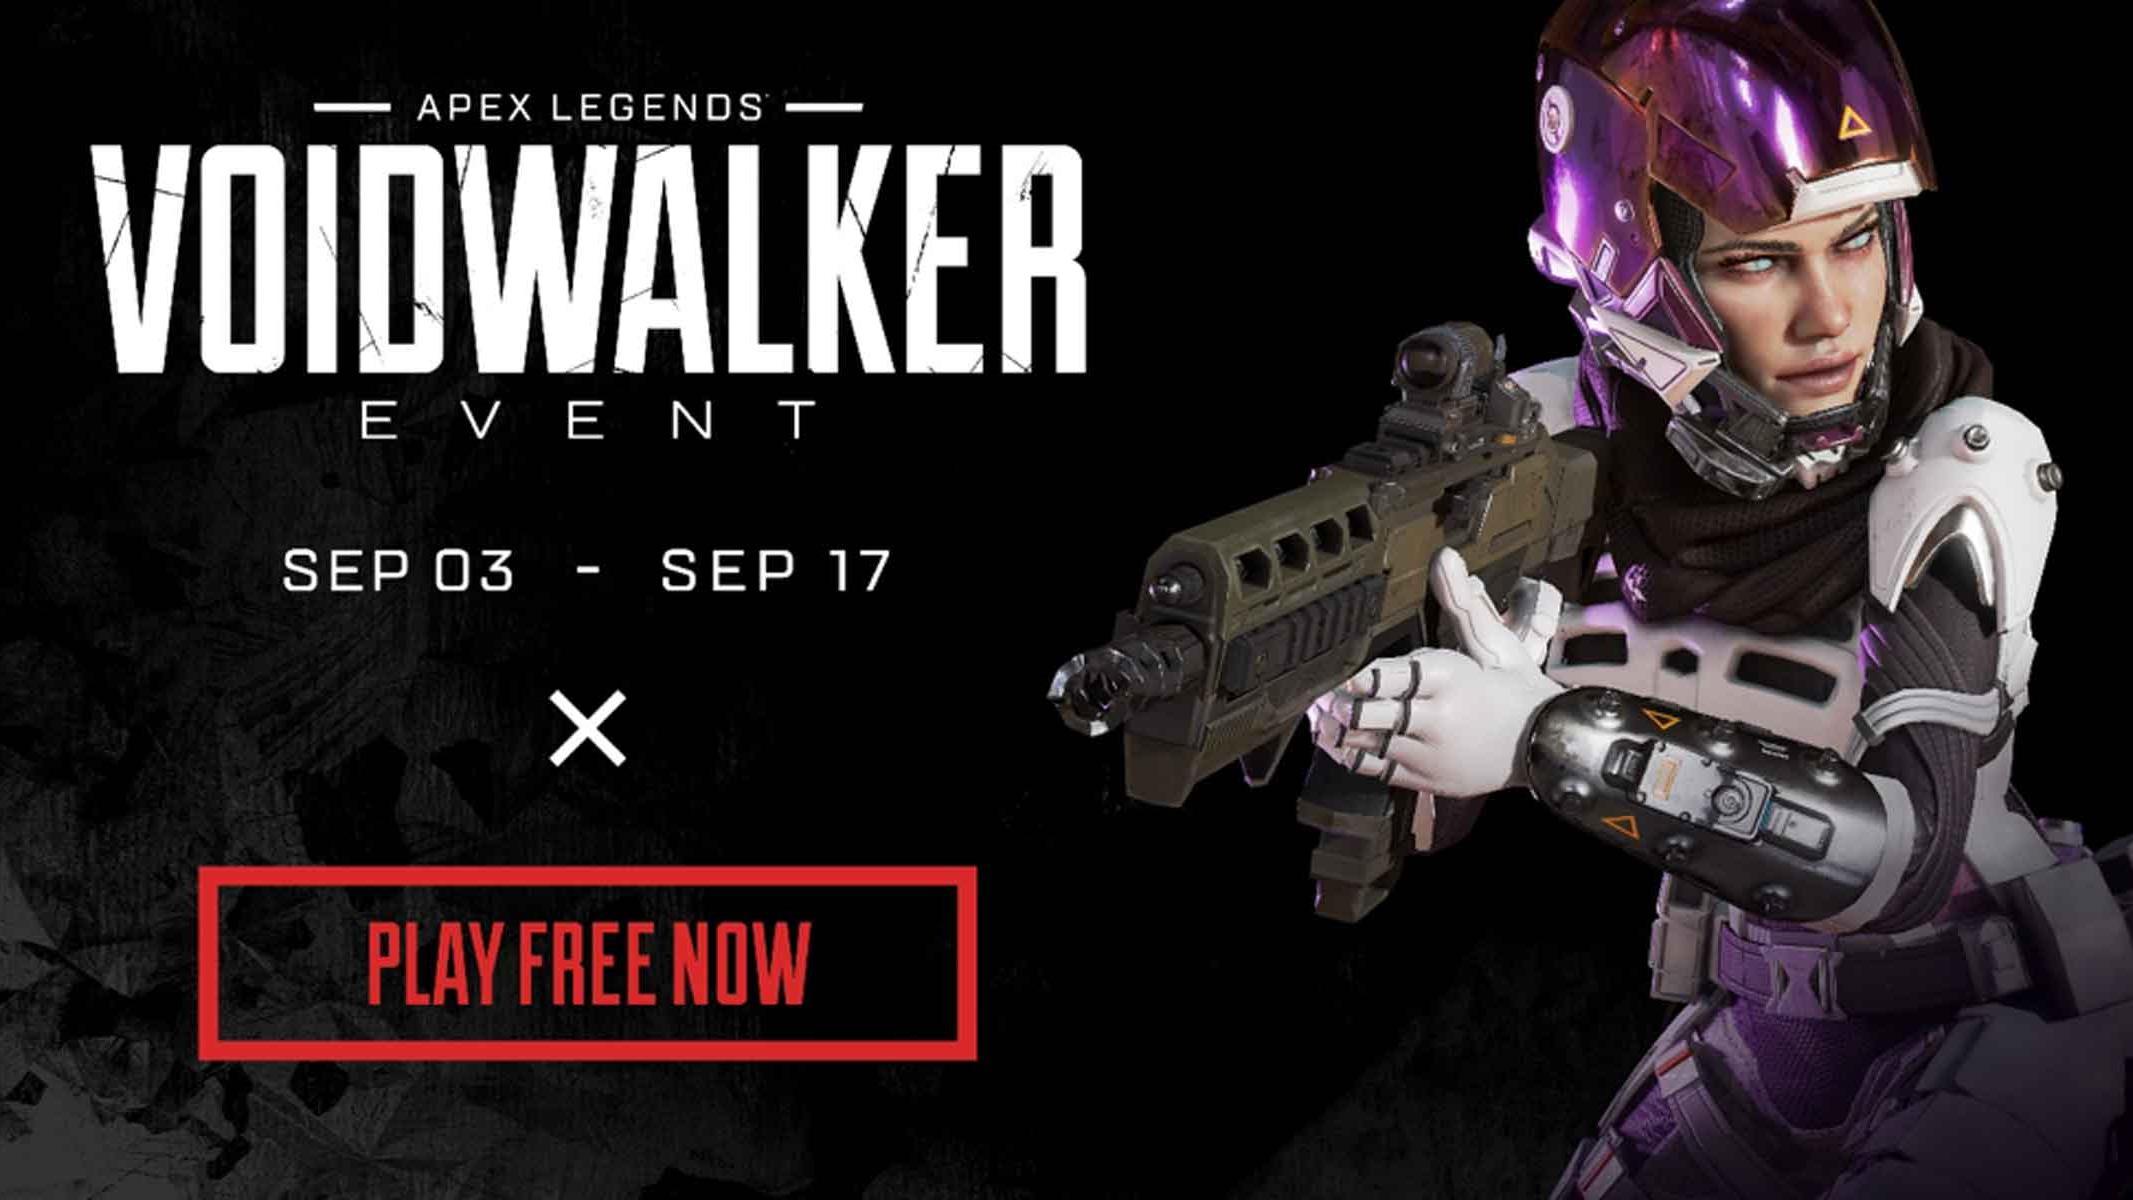 Apex Legends Voidwalker Event New Challenges Loot Kick Off